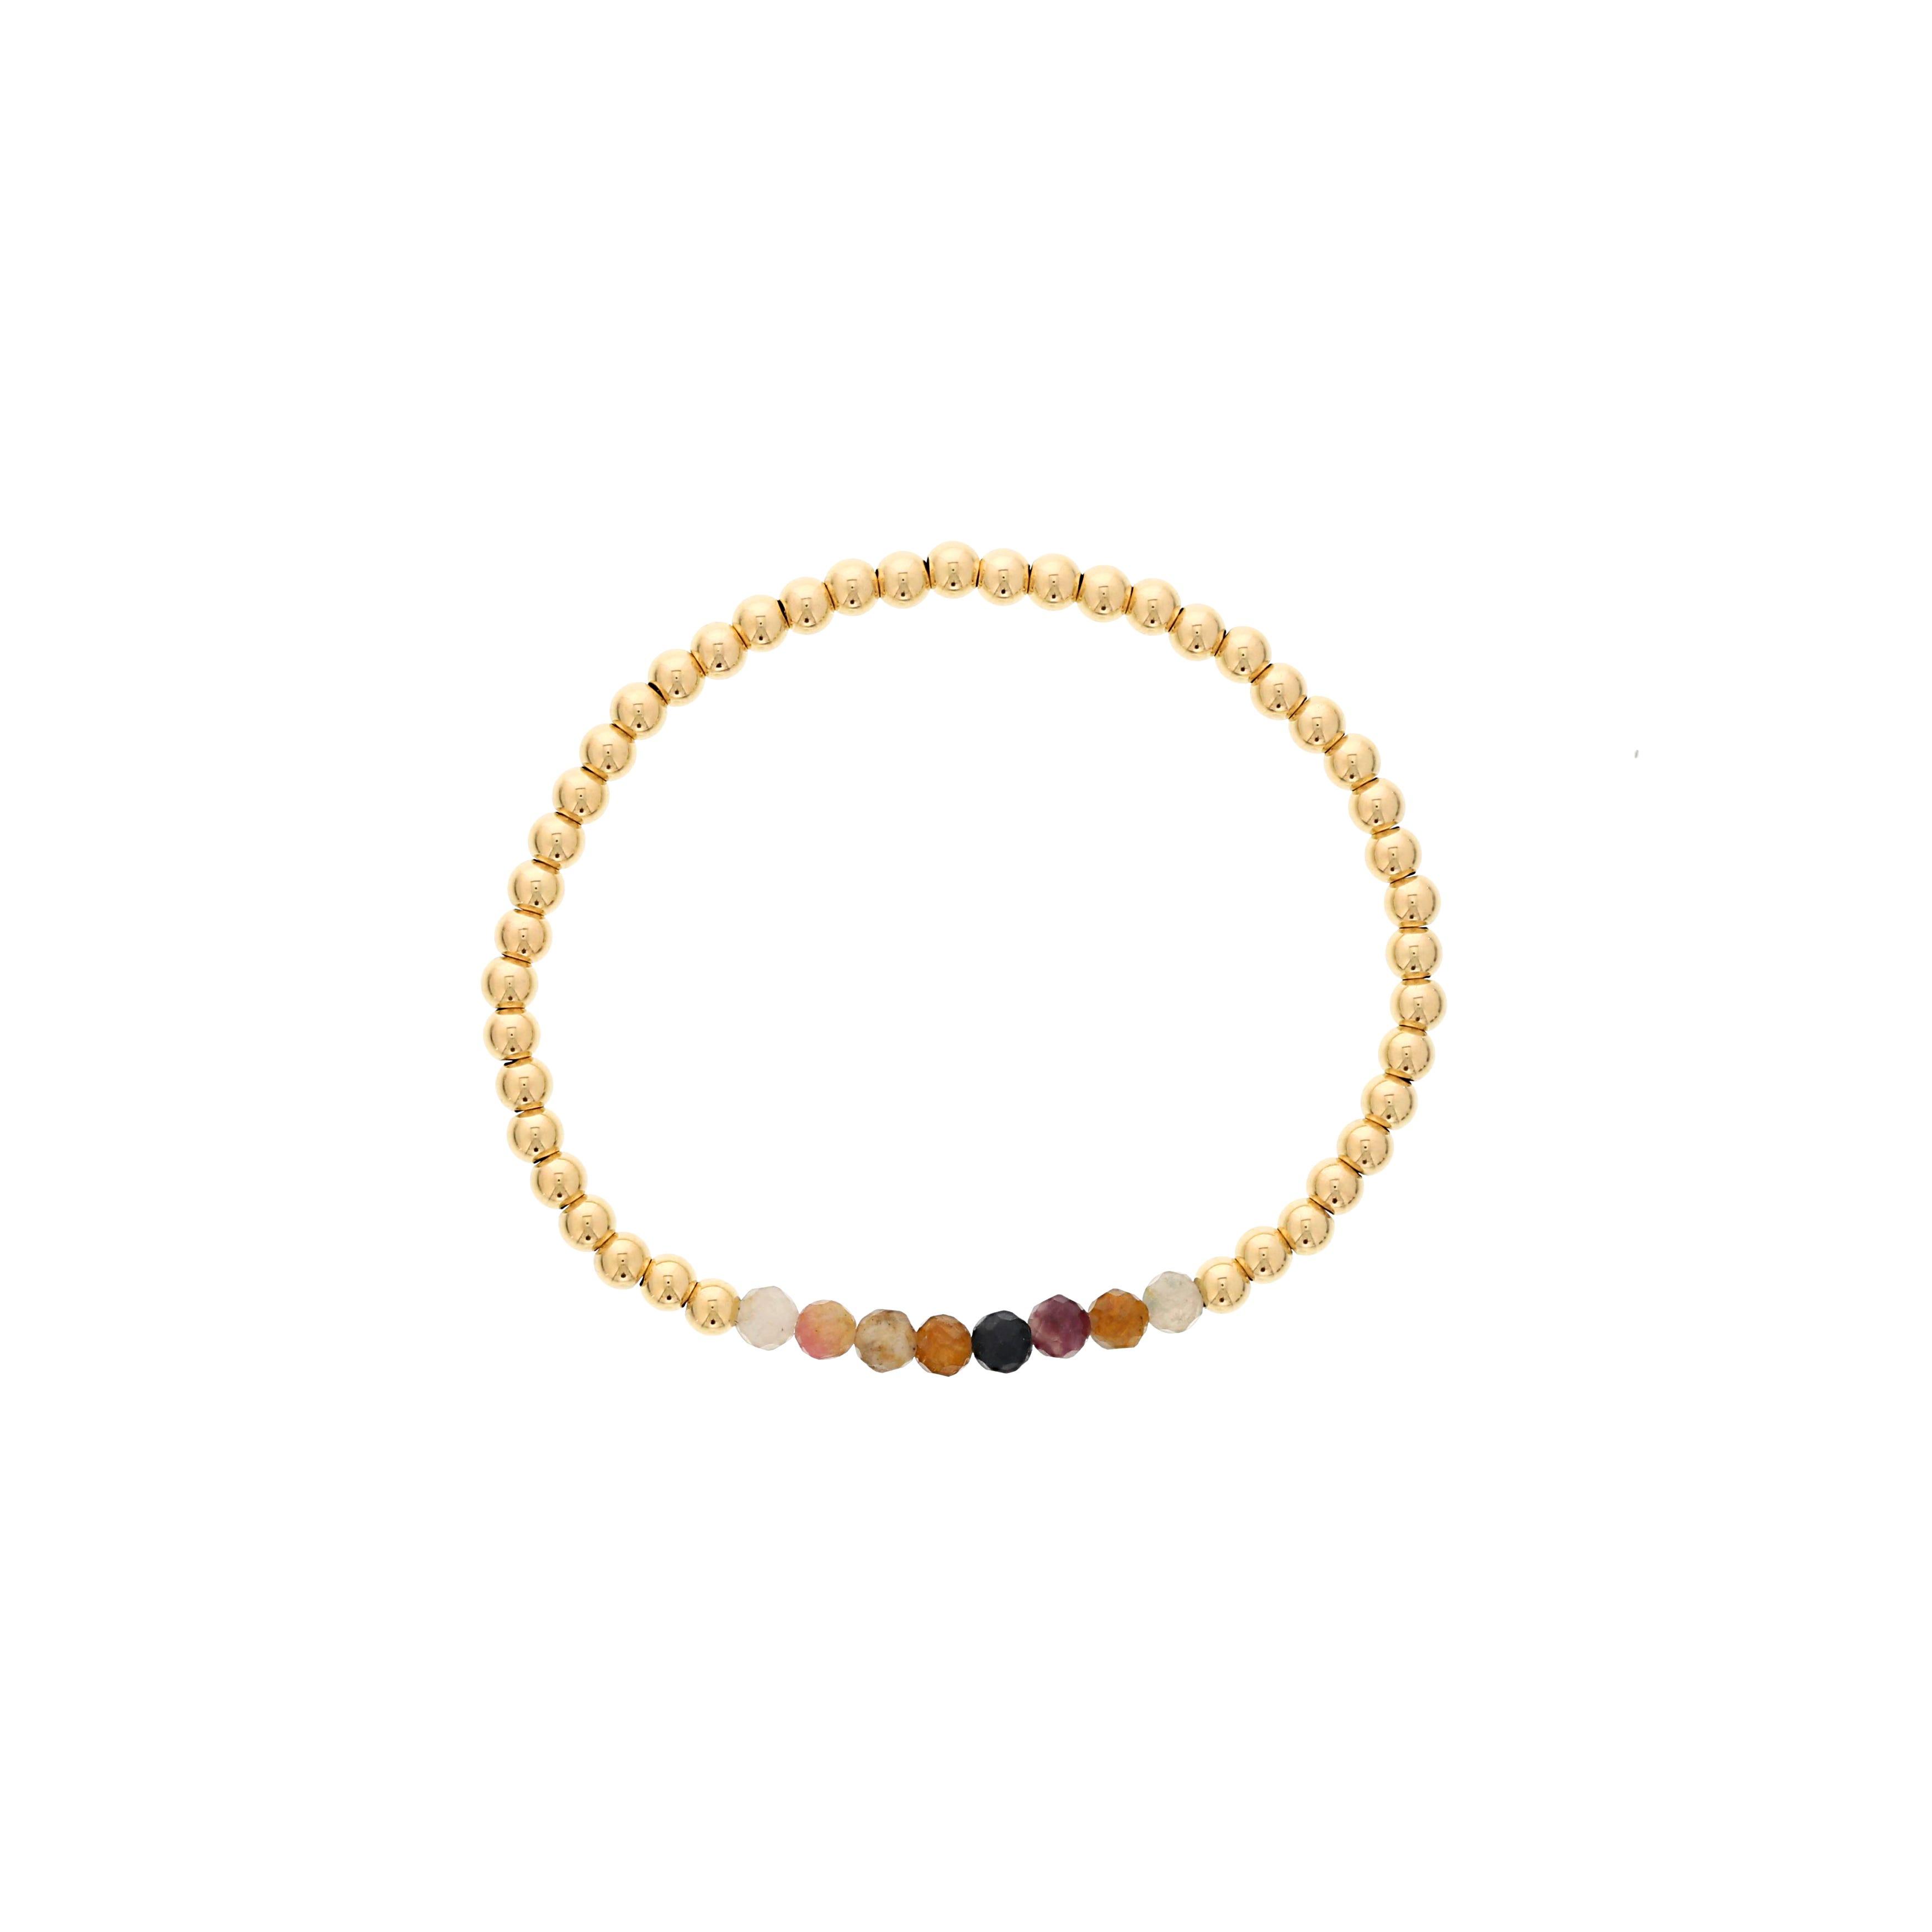 Multi-Color Tourmaline Birthstone Beaded Bracelet Gold Filled